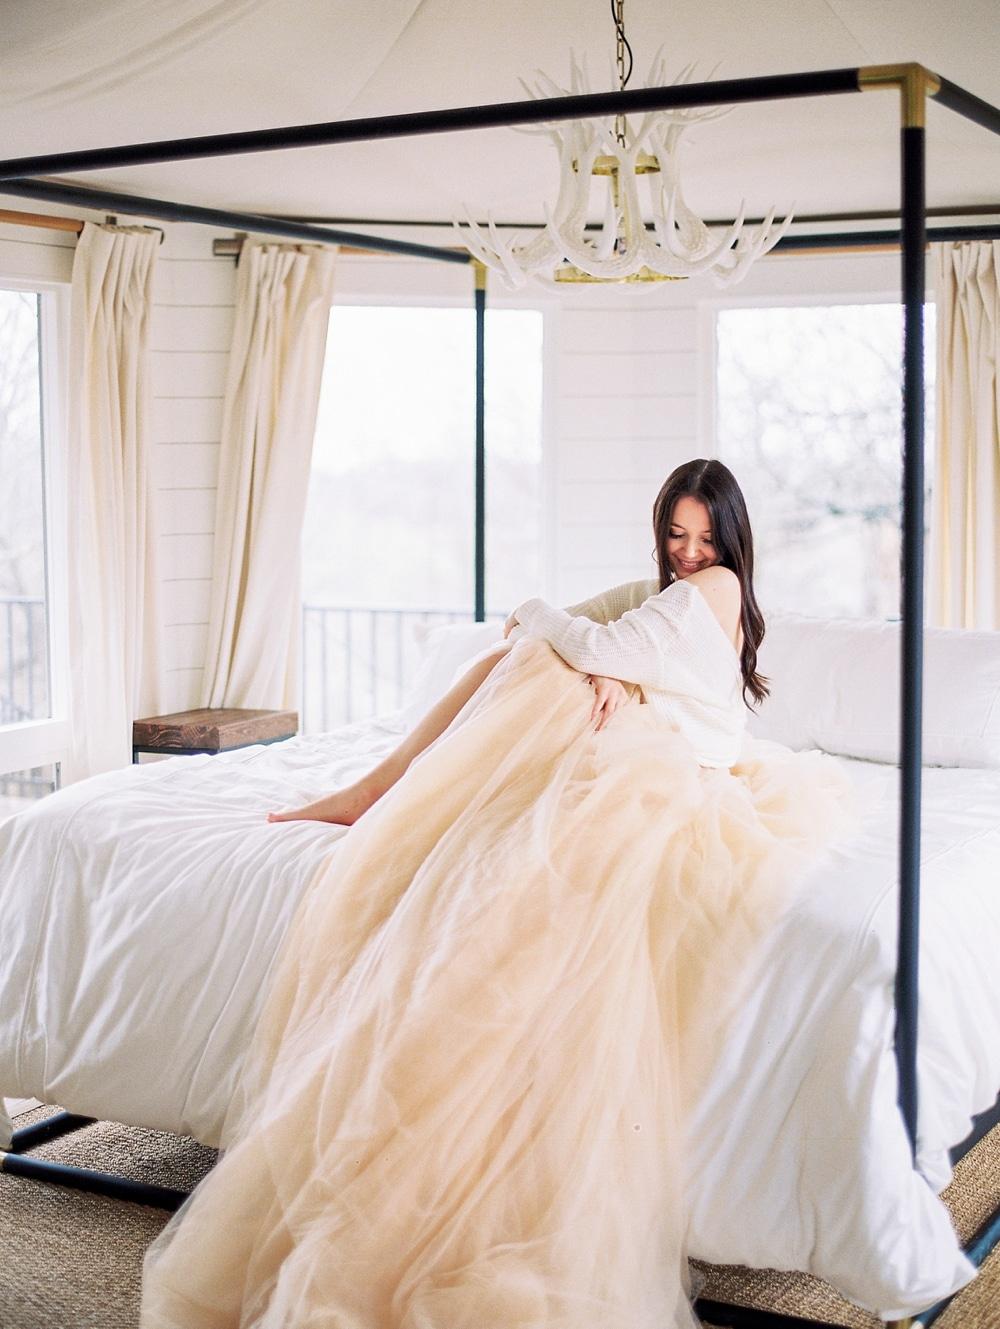 Kristin-La-Voie-Photography-fine-art-wedding-bridal-boudoir-texas-photographer-Dallas-Austin-San-Marcos-wahwahtaysee-resort-109